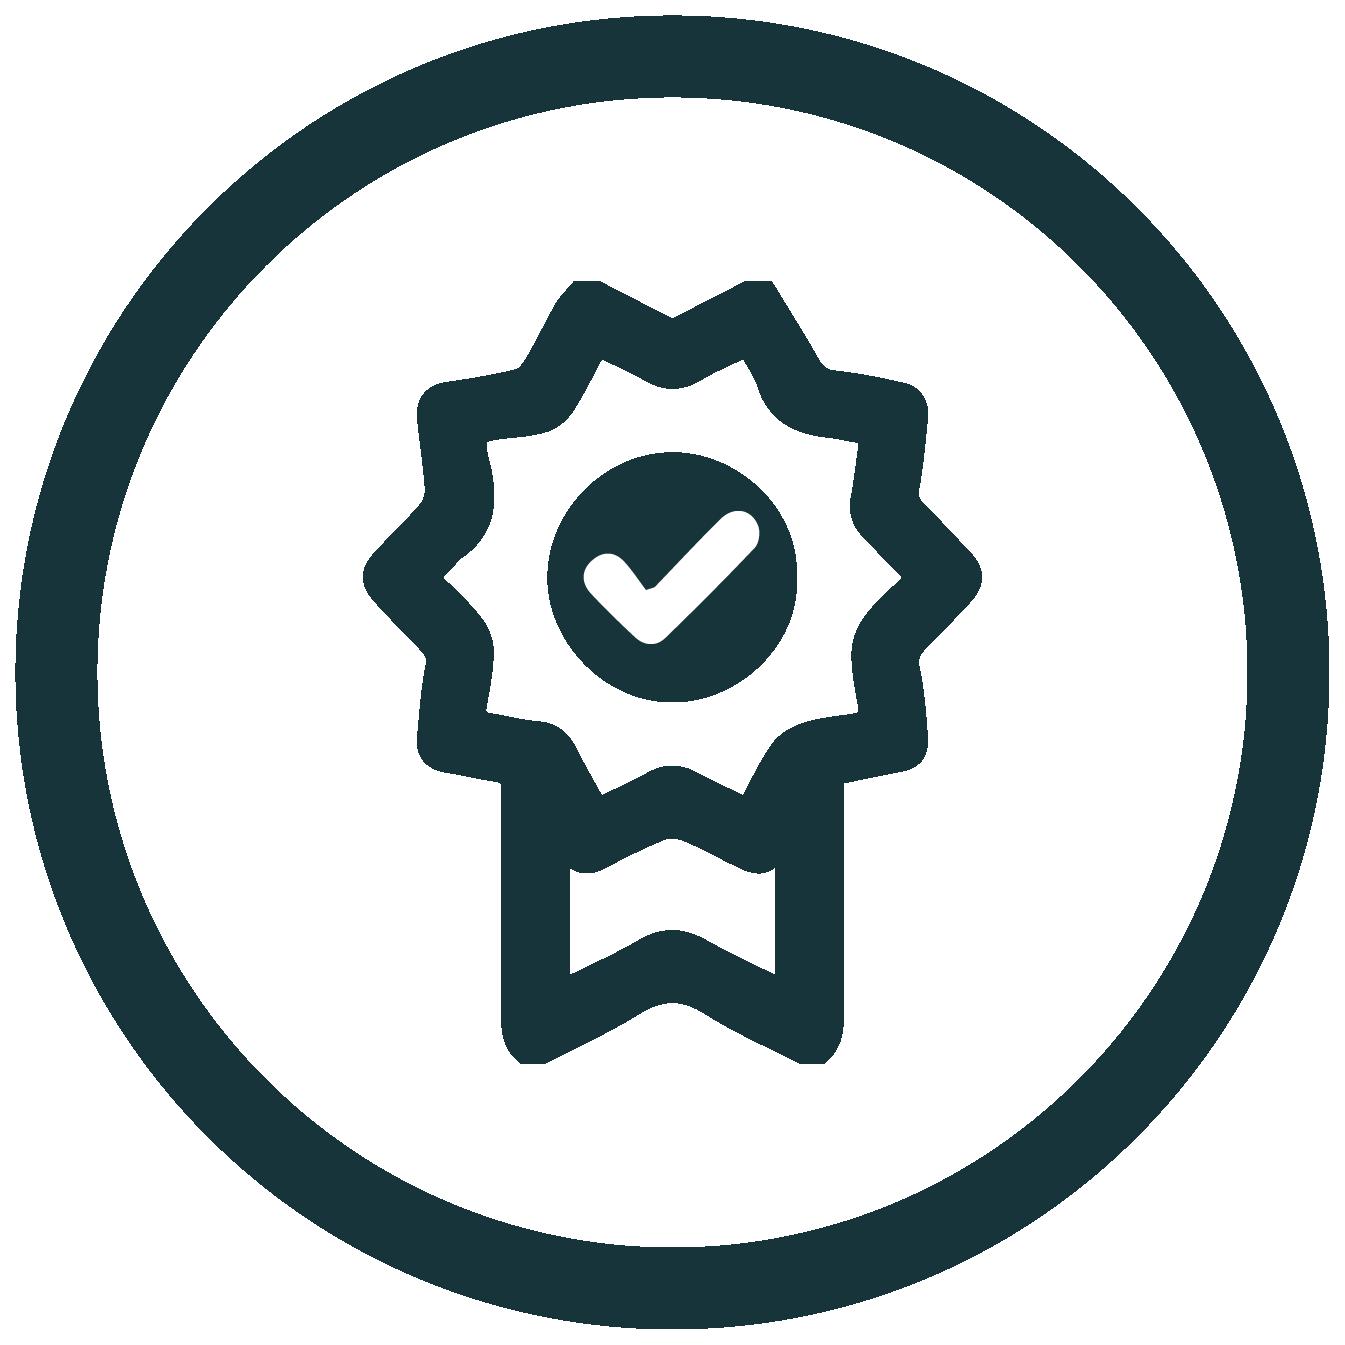 qualität icon5.png